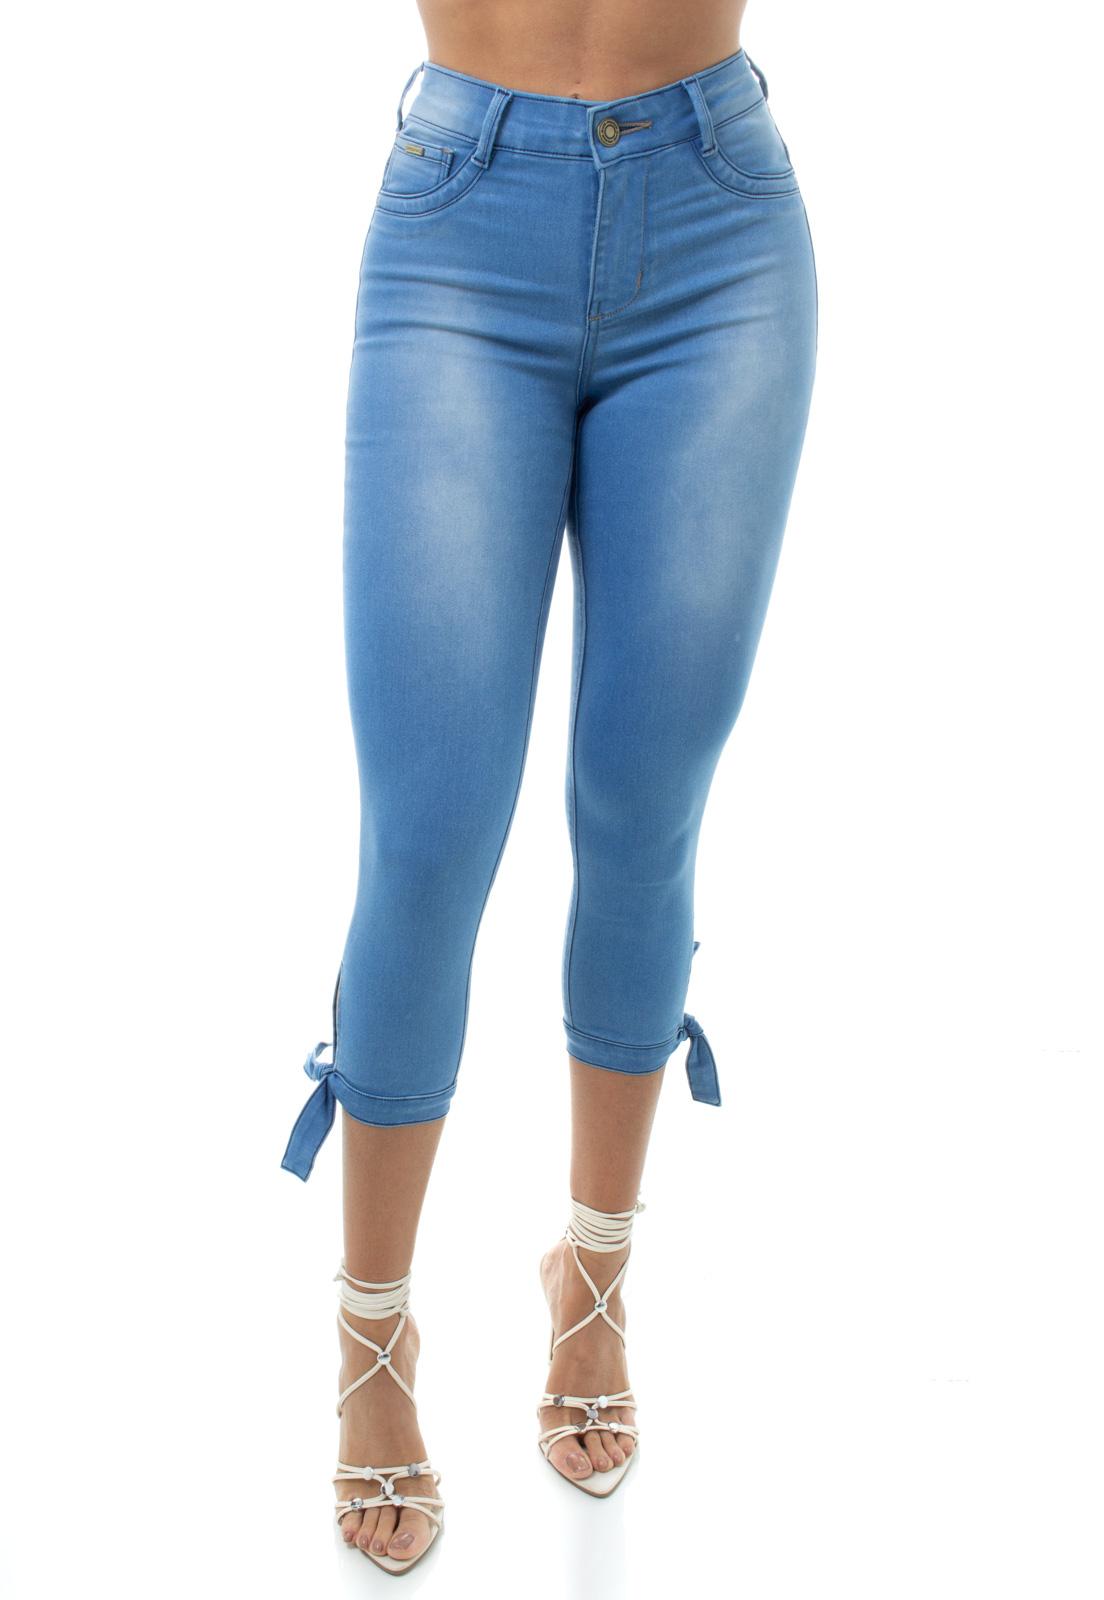 Calça Capri Jeans Feminina Crocker - 48141  - CROCKER JEANS